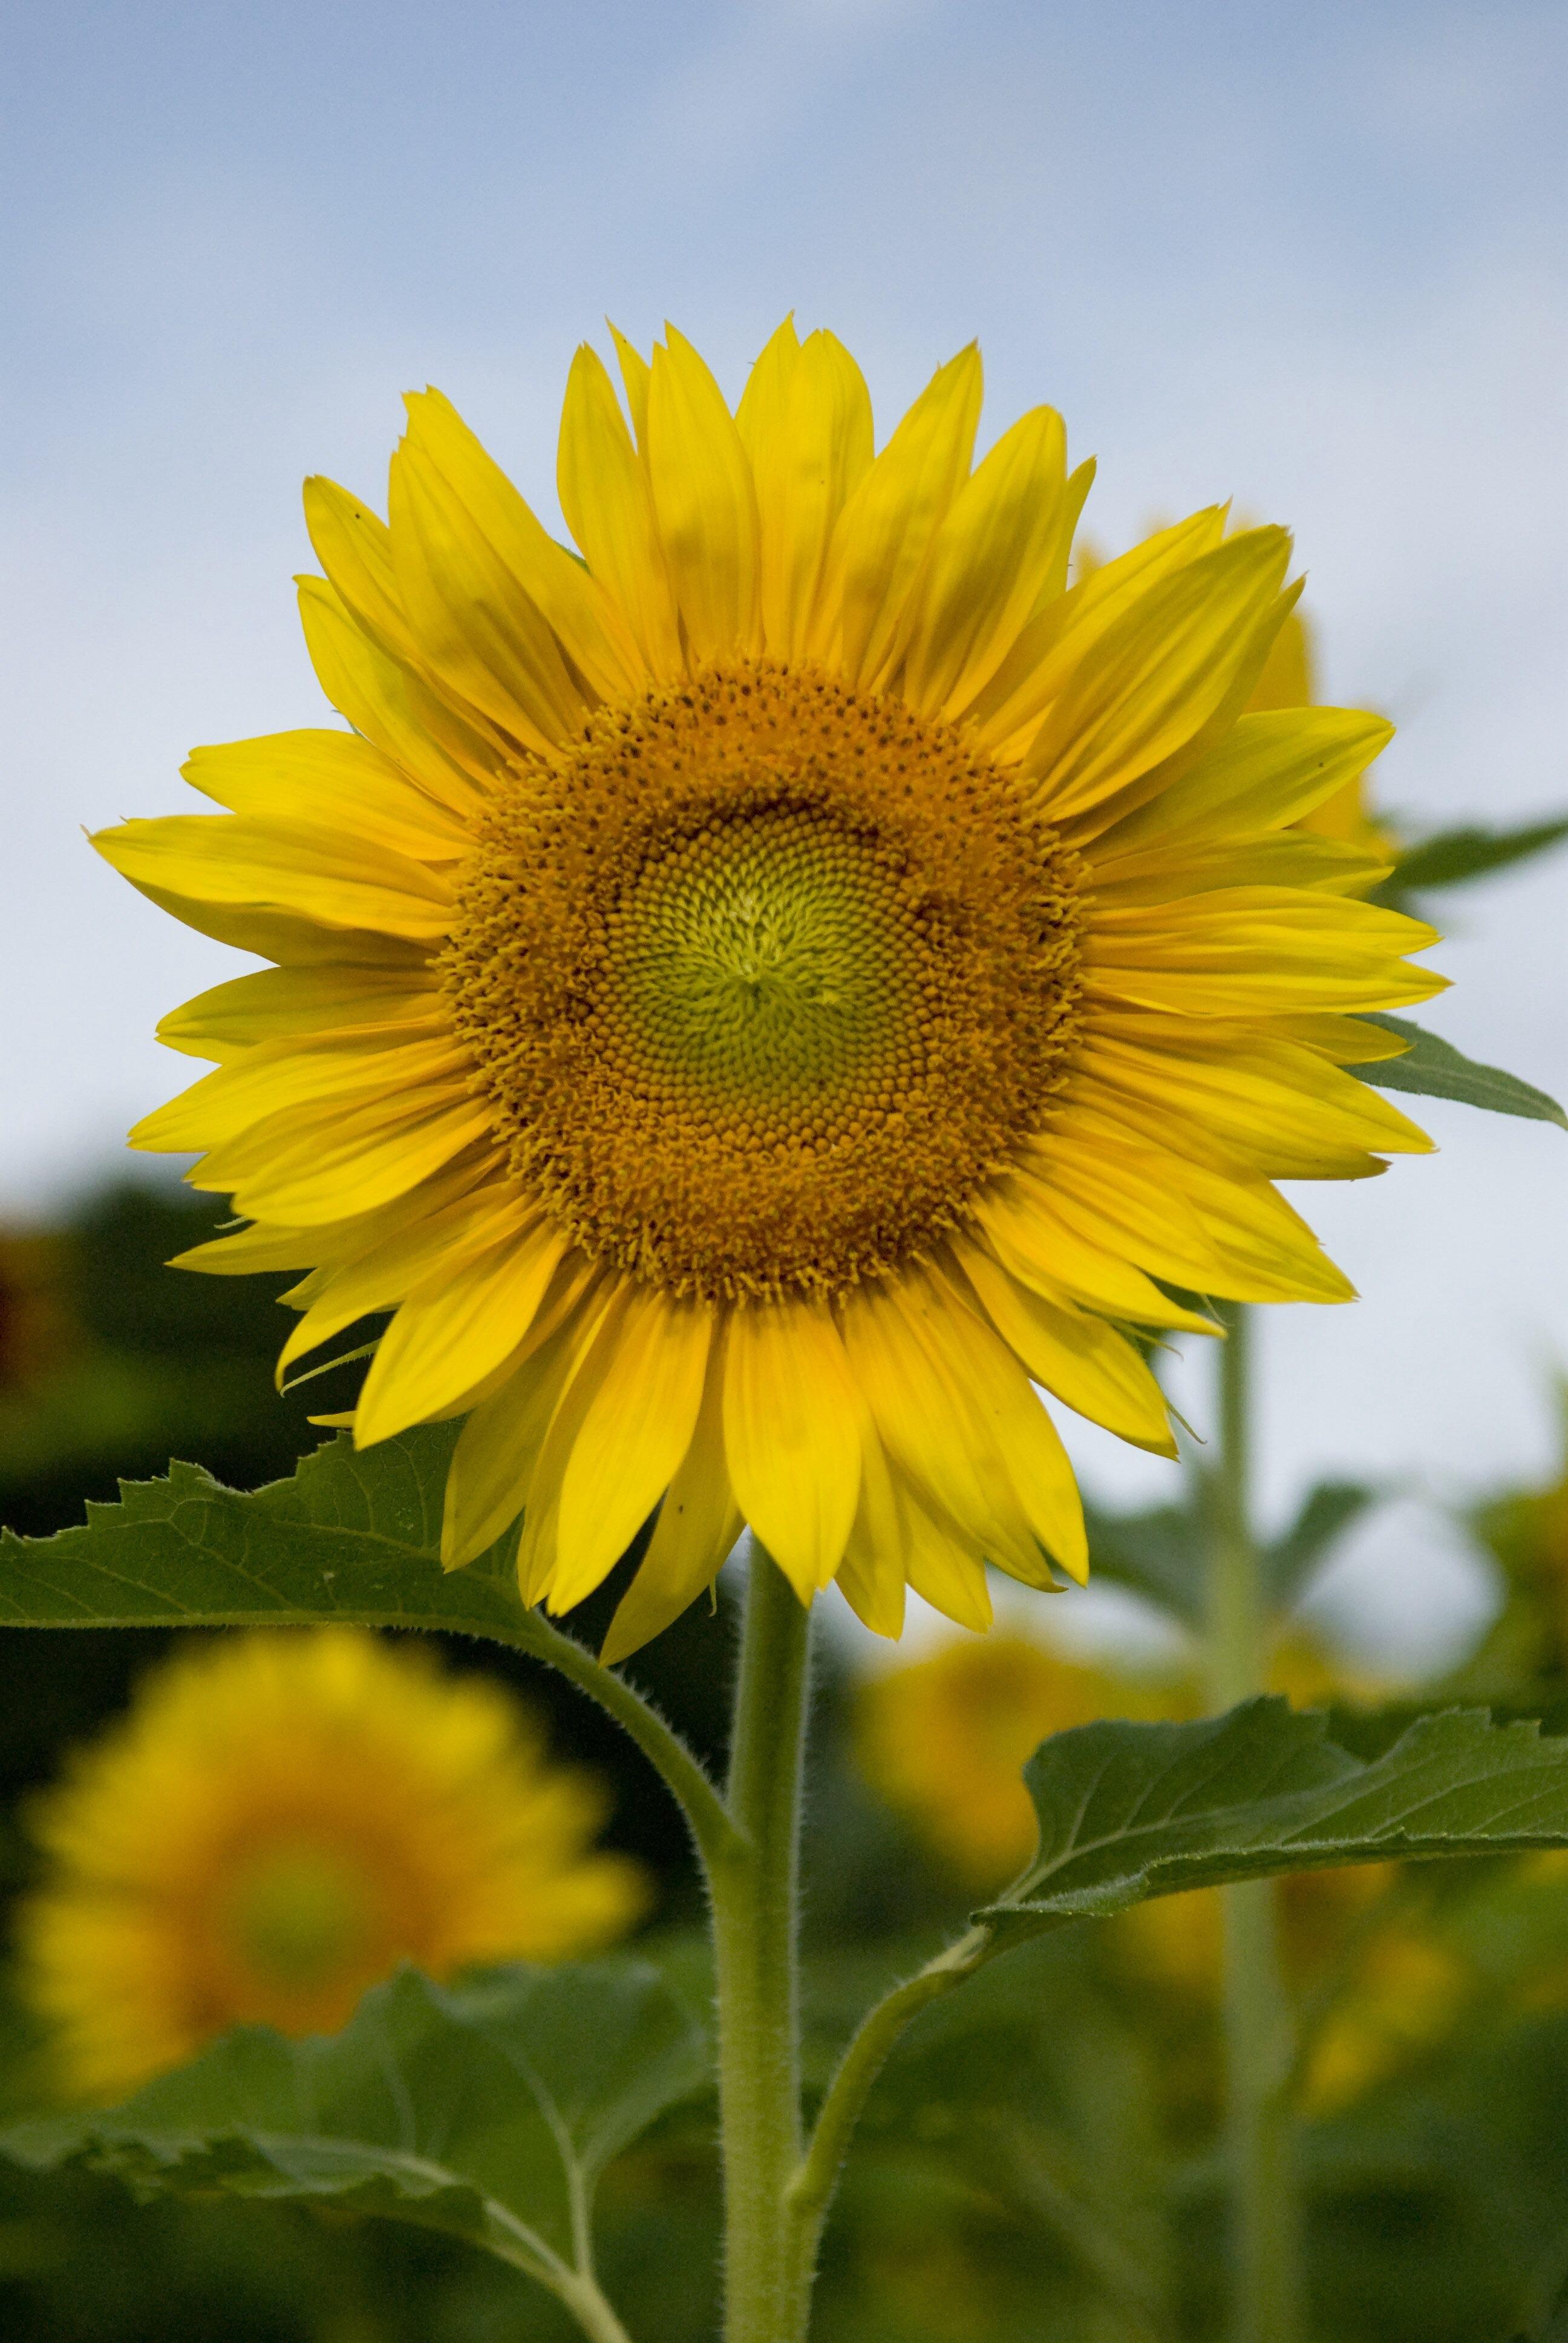 Kansas sunflower farm has fans across the world